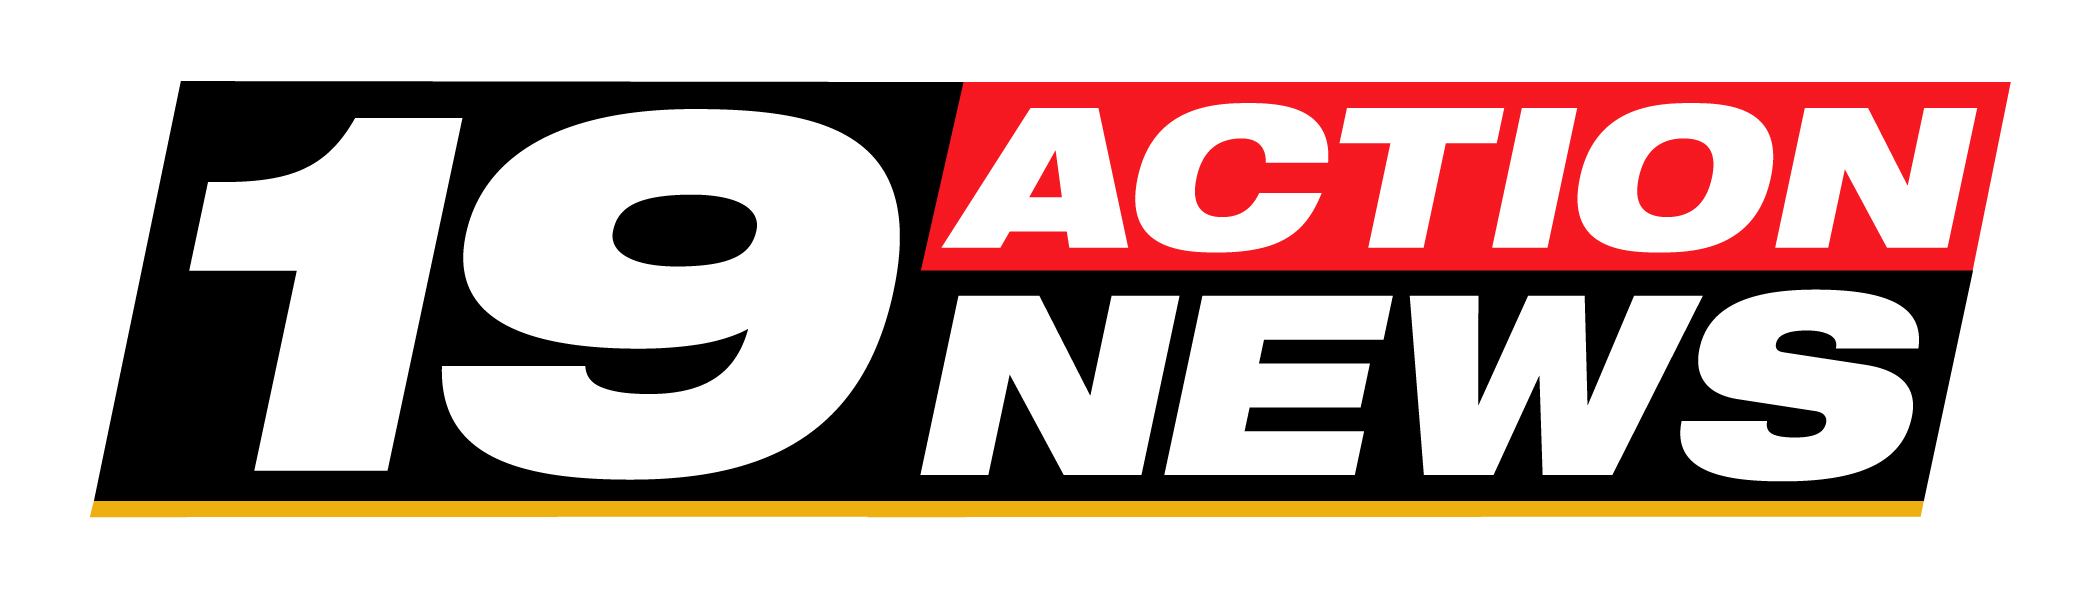 Image - 19 Acti... News Logo Images